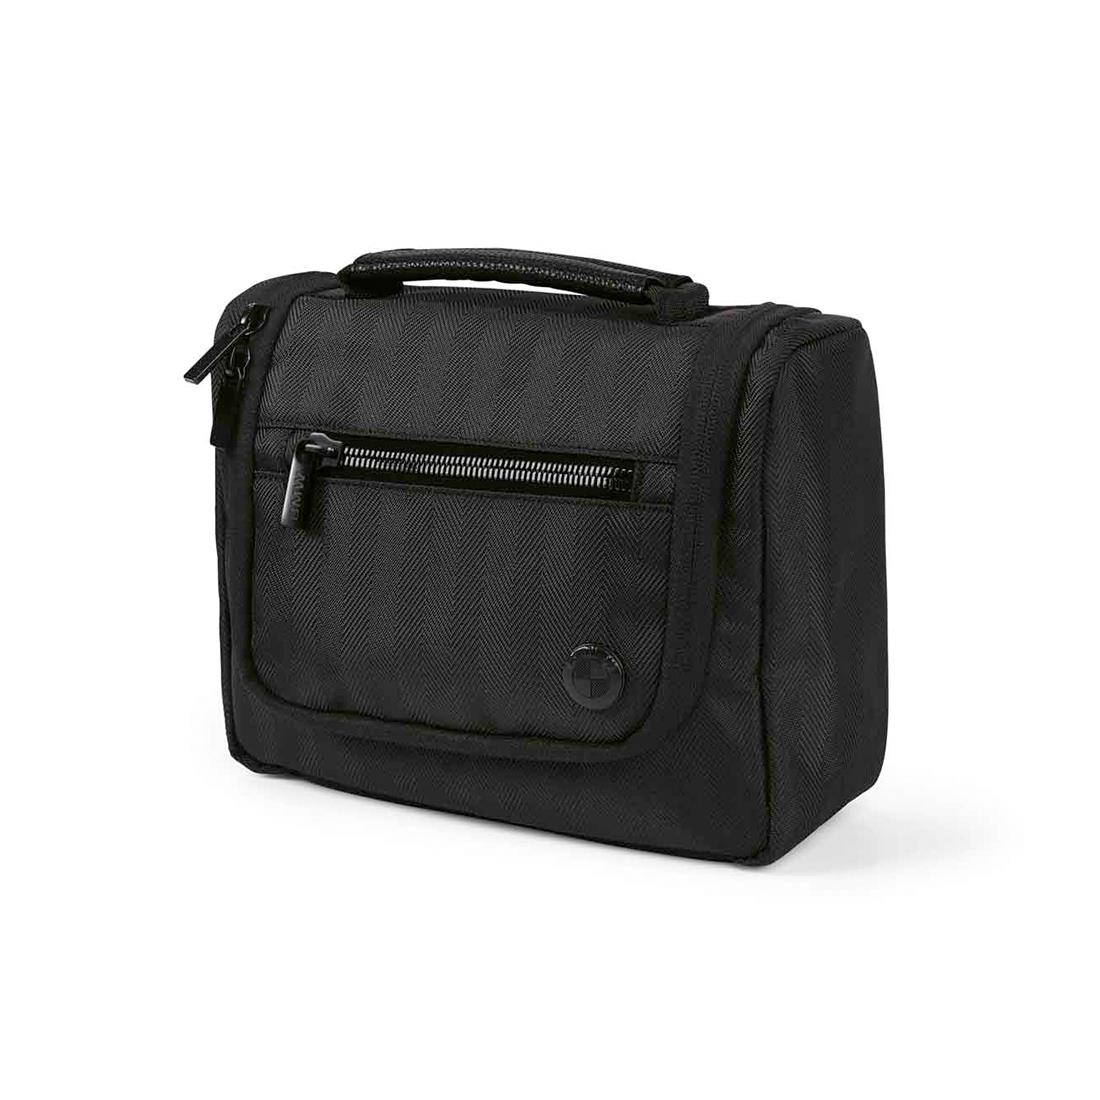 BMW Toiletry Bag